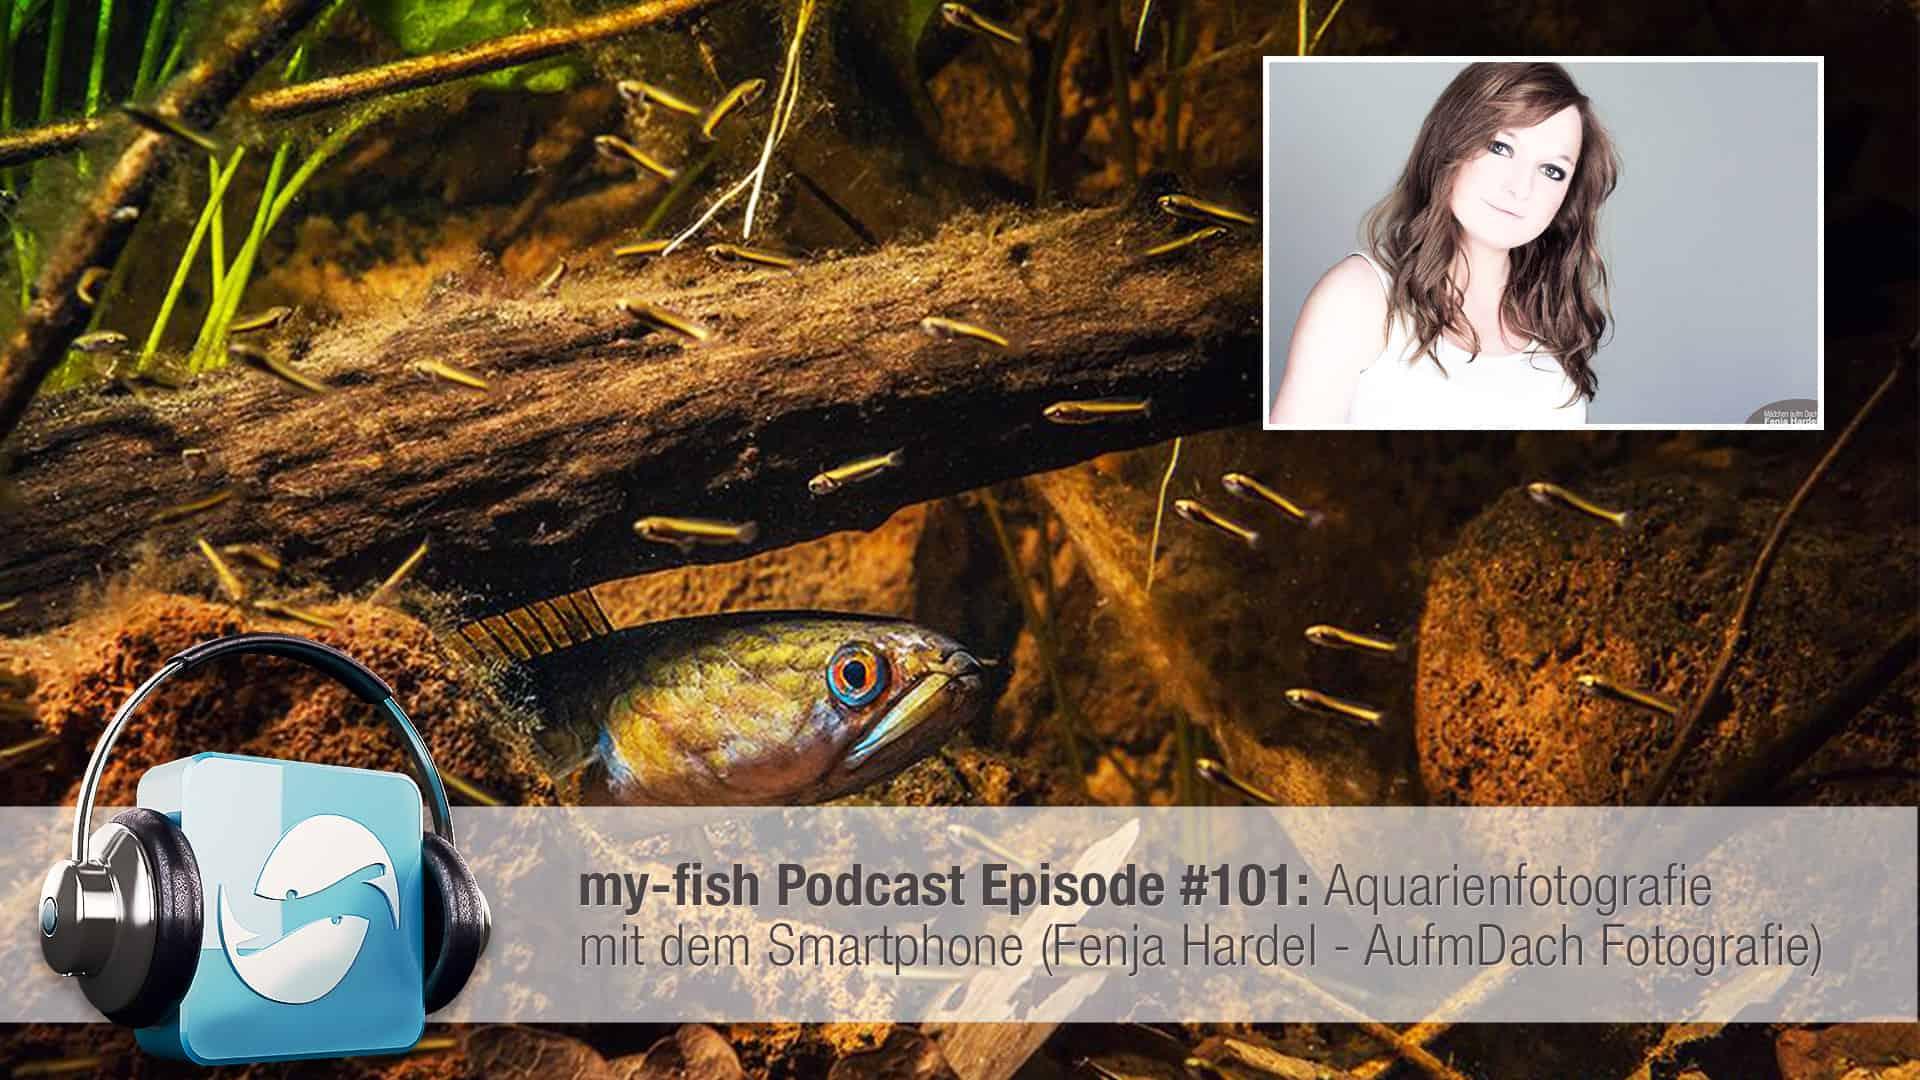 Podcast Episode #101: Aquarienfotografie mit dem Smartphone (Fenja Hardel - AufmDach Fotografie) 1